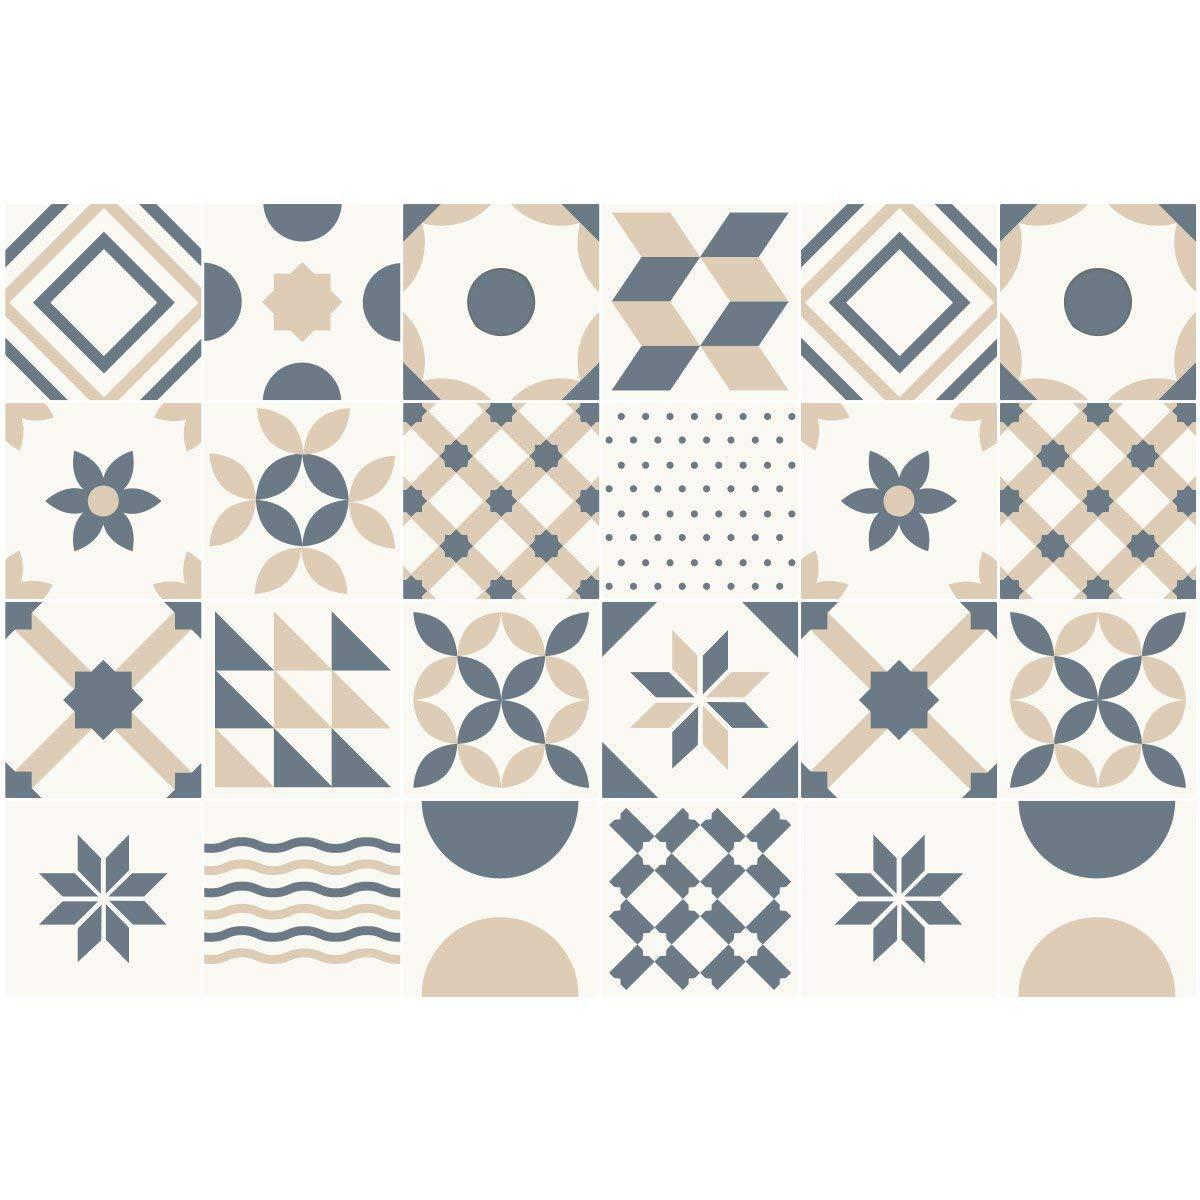 Ambiance-Live Karo-Zement Wandtattoo Wandtattoo Wandtattoo – BlauEJOS – 20 x 20 cm – 24-teilig B072QD5WM5 Wandtattoos & Wandbilder a29c96